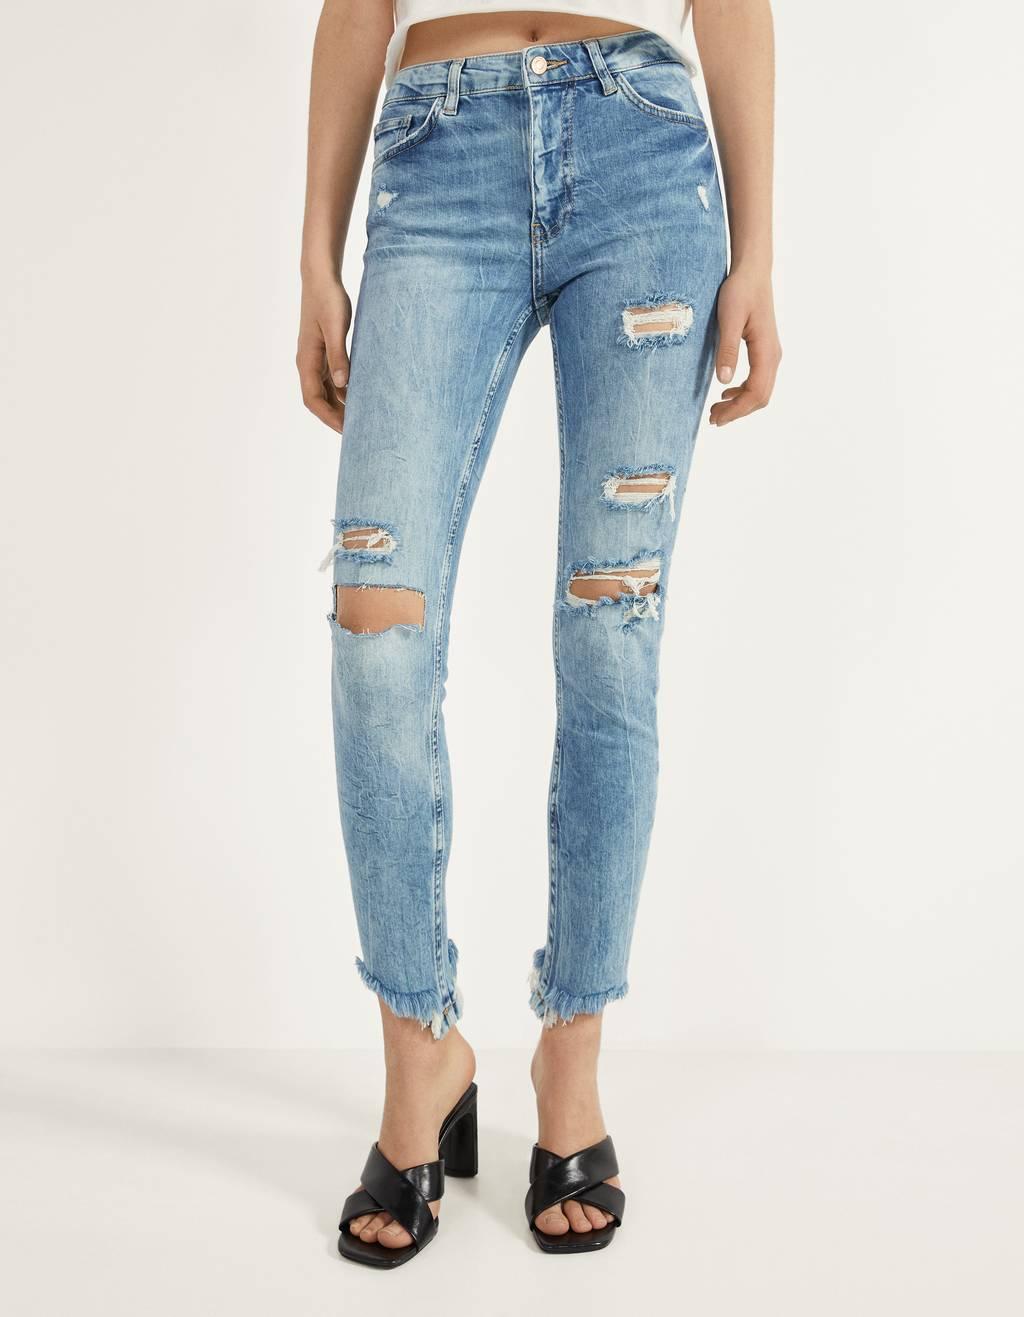 Jeans Skinny Fit Mid Waist